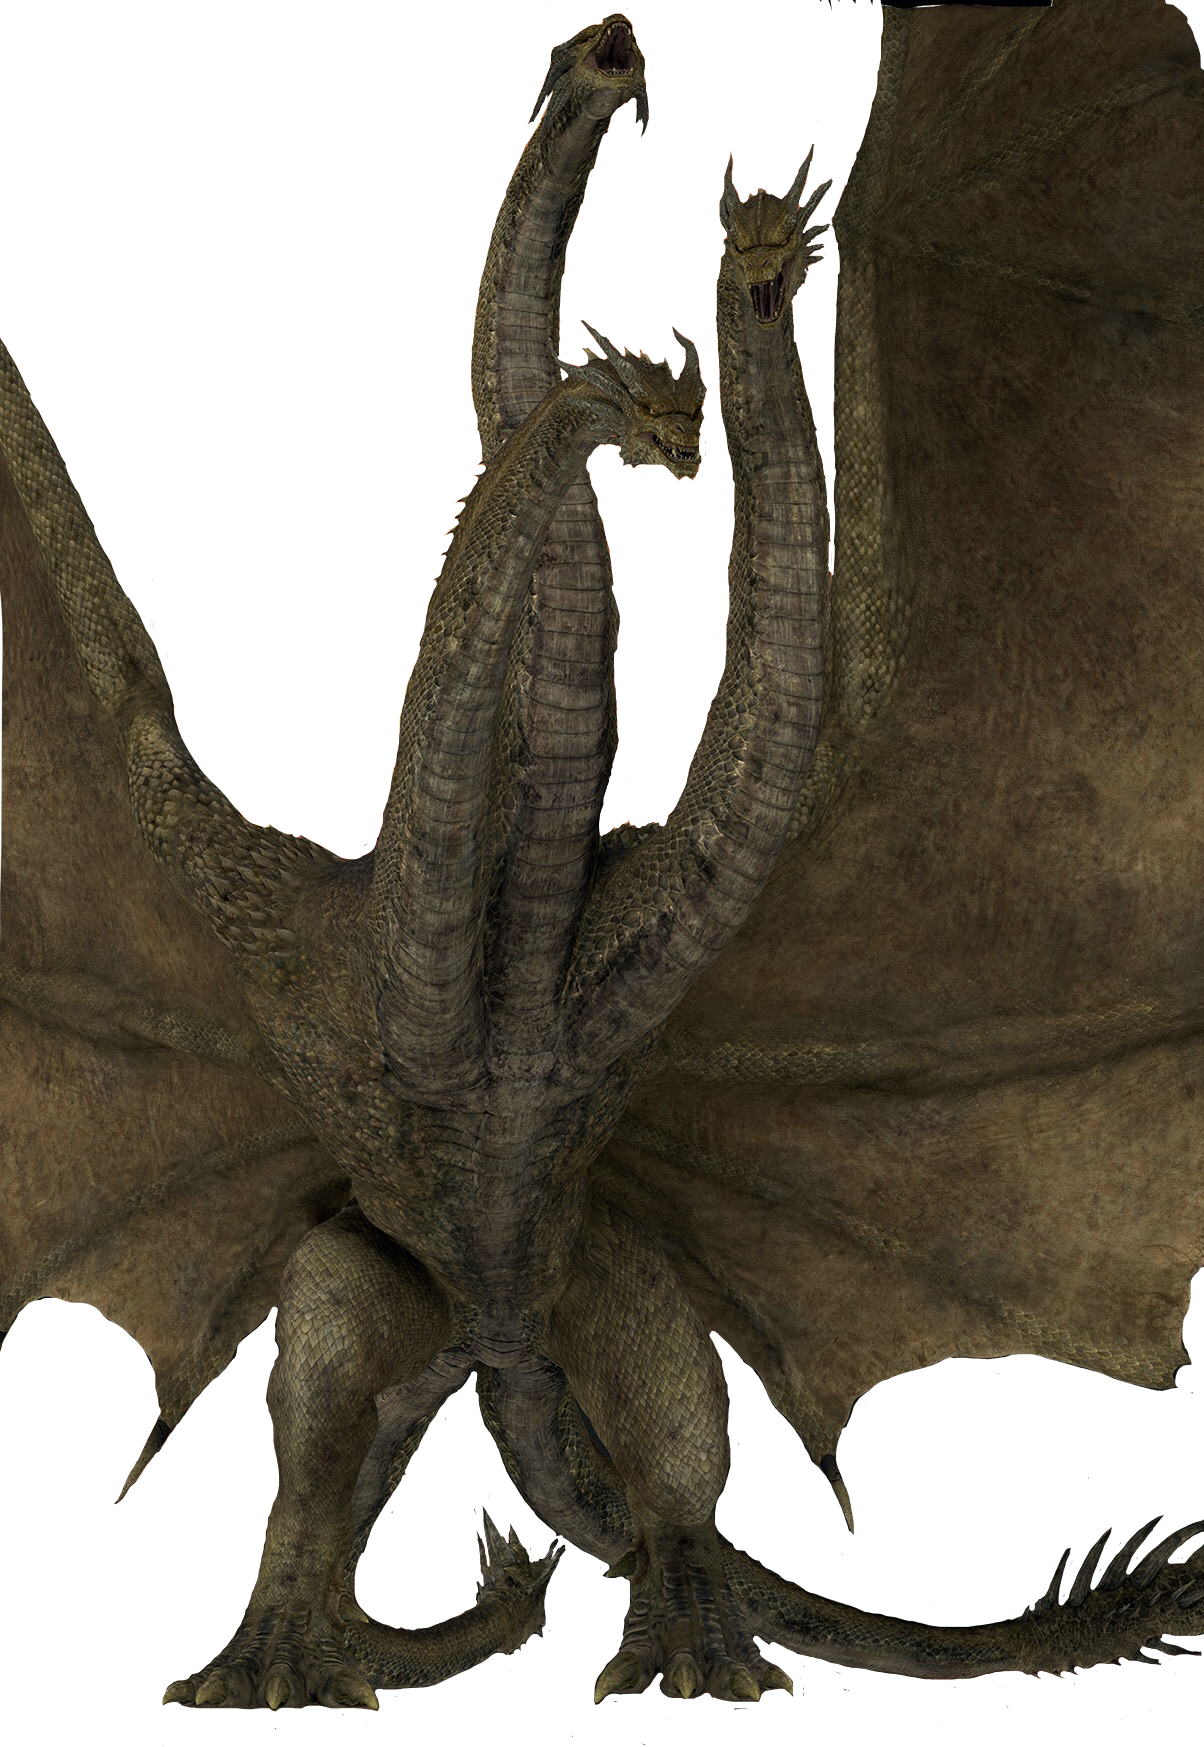 King Ghidorah 2019 Render By Magarame On Deviantart Godzilla Kong Godzilla Kaiju Monsters